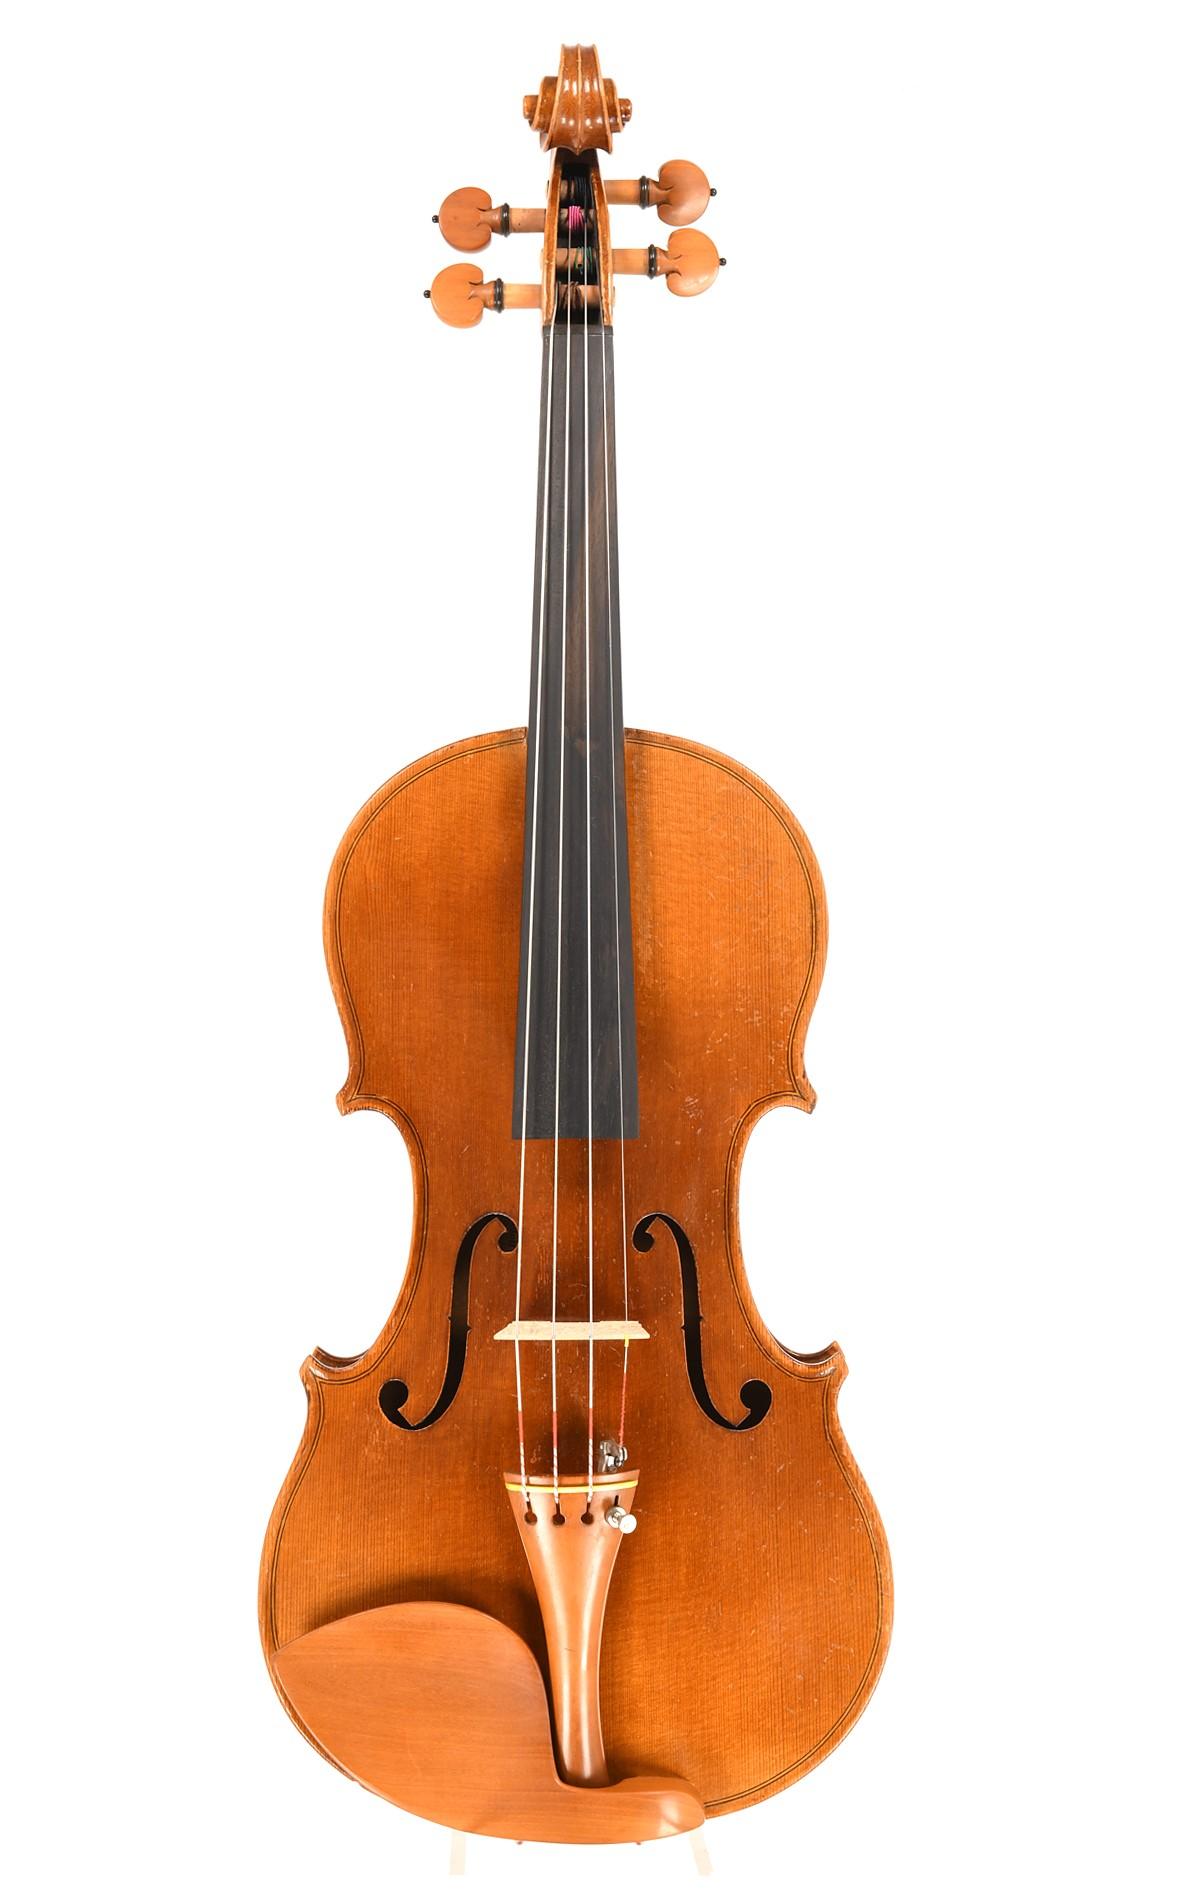 Antique violin by Adolf Sprenger, Stuttgart, 1915